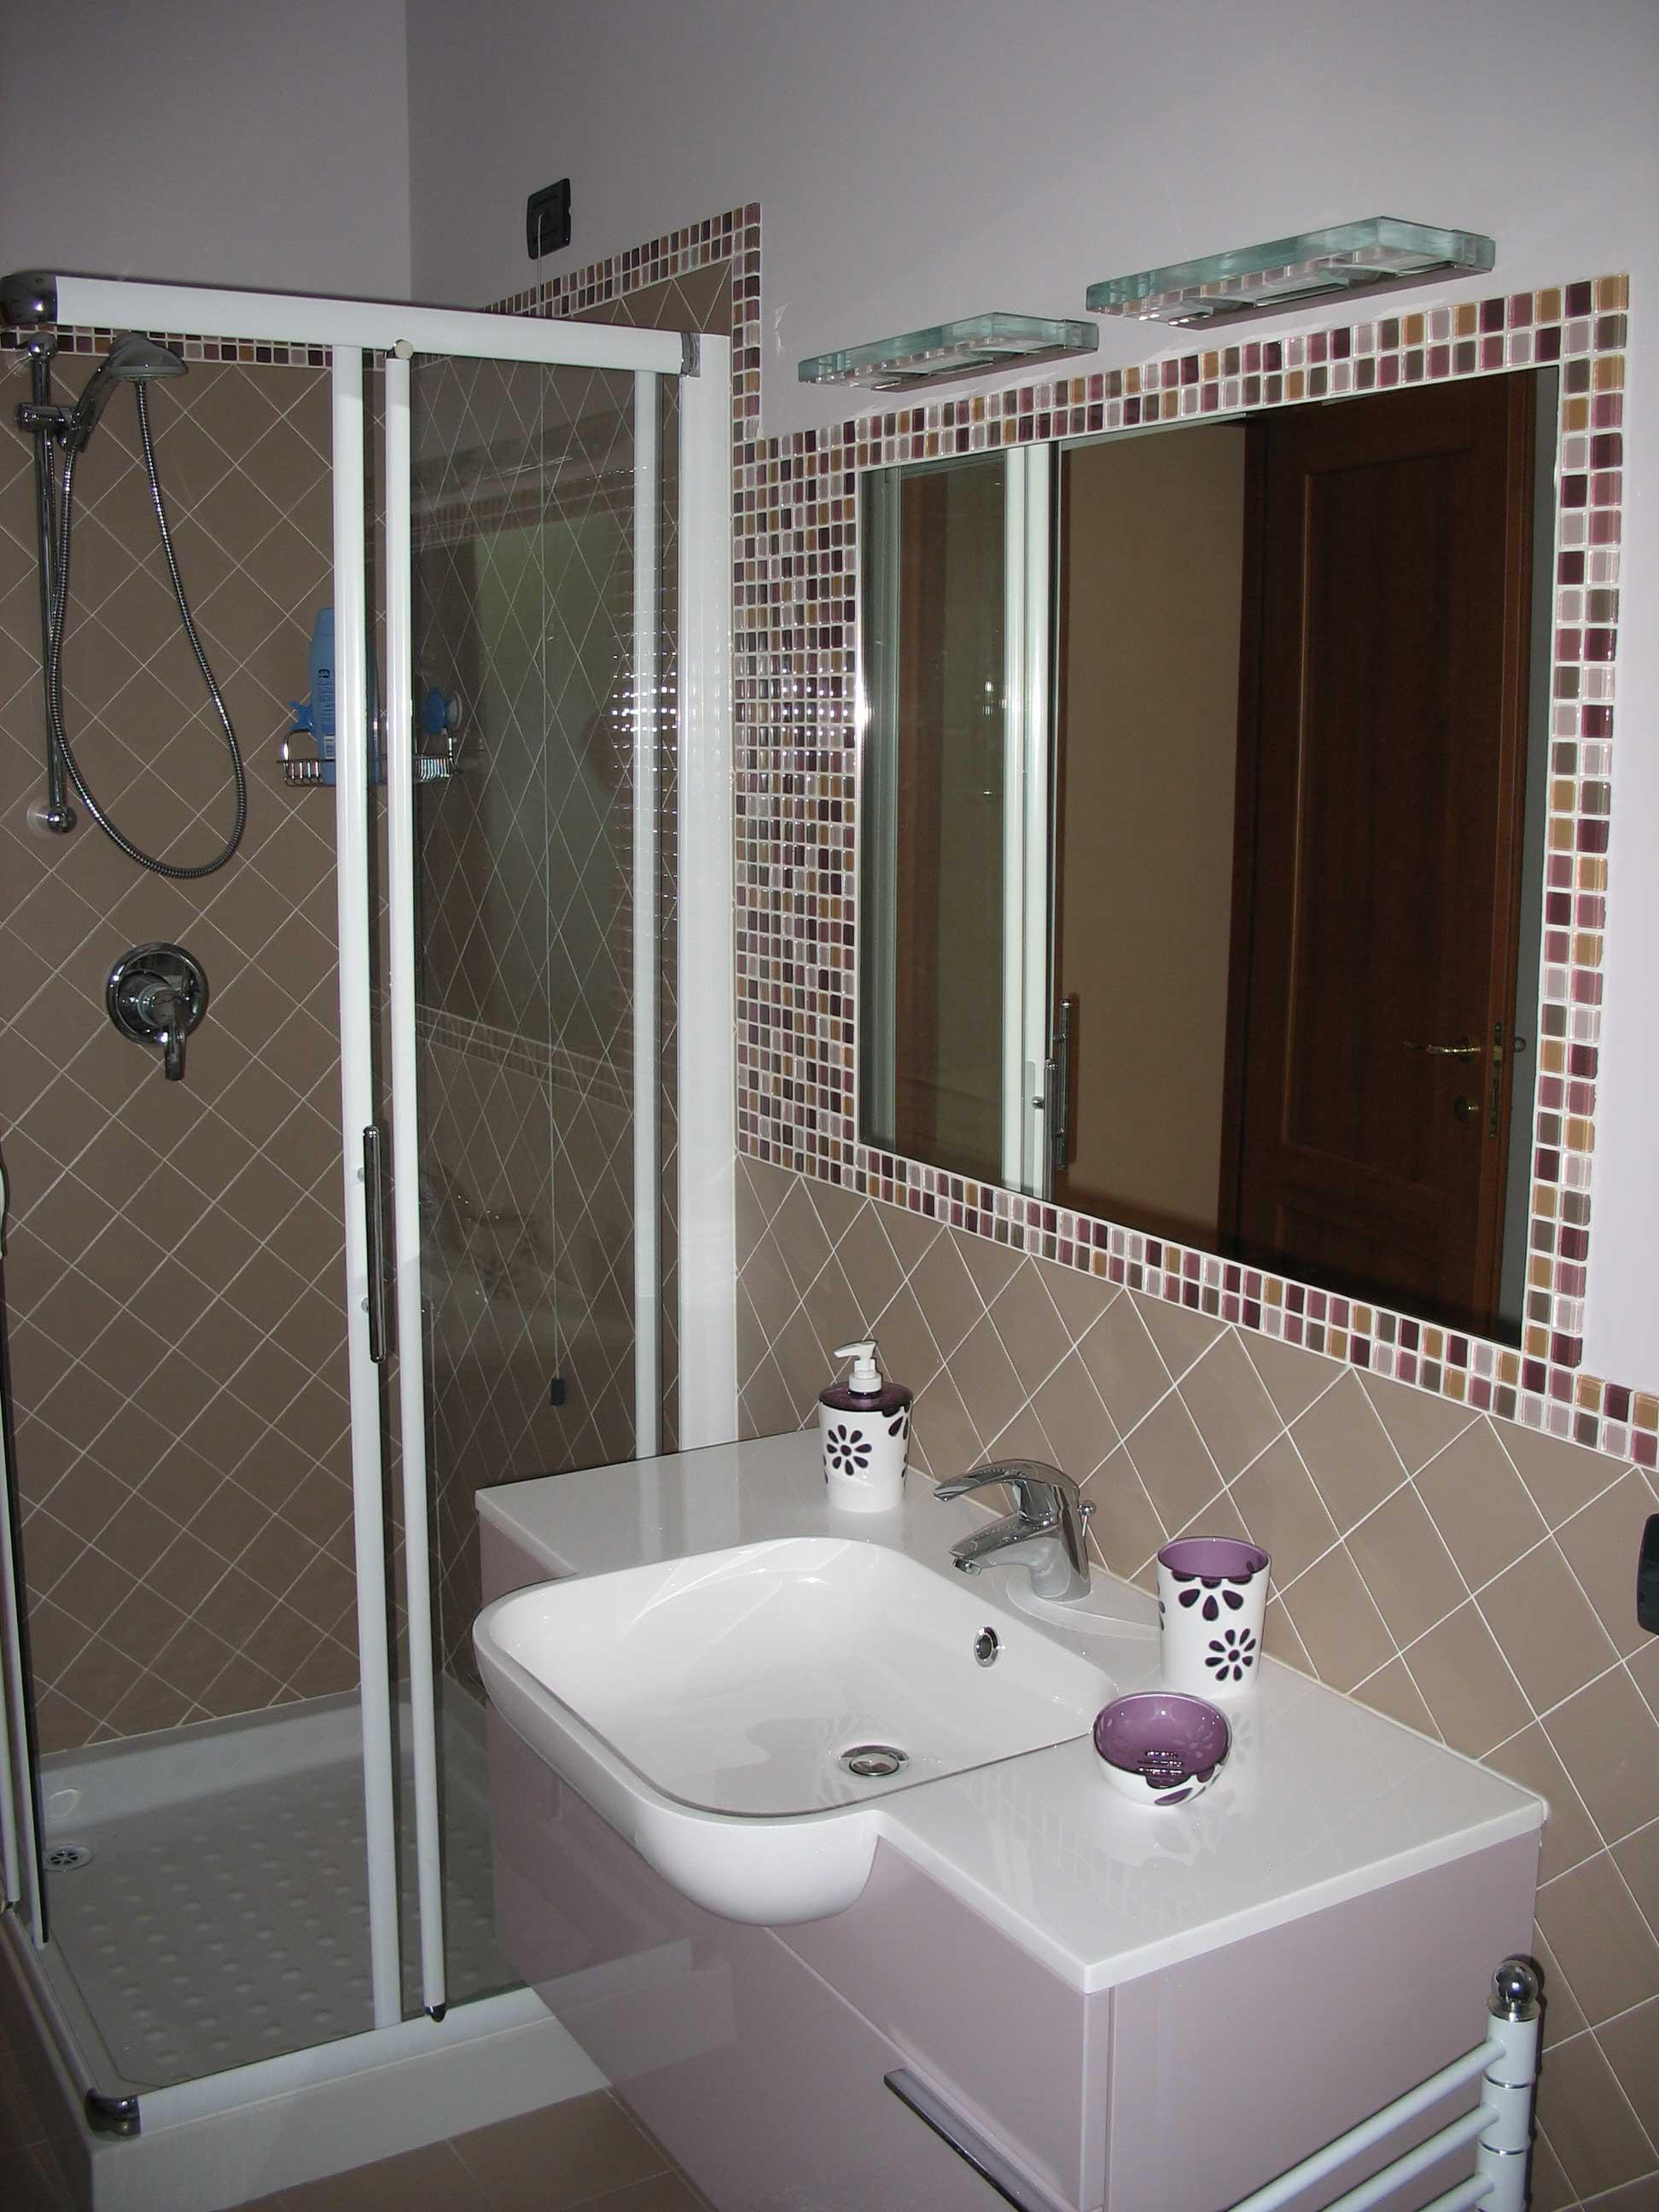 I mosaici piastrellista cremona pavimenti rivestimenti for Mosaici pavimenti interni